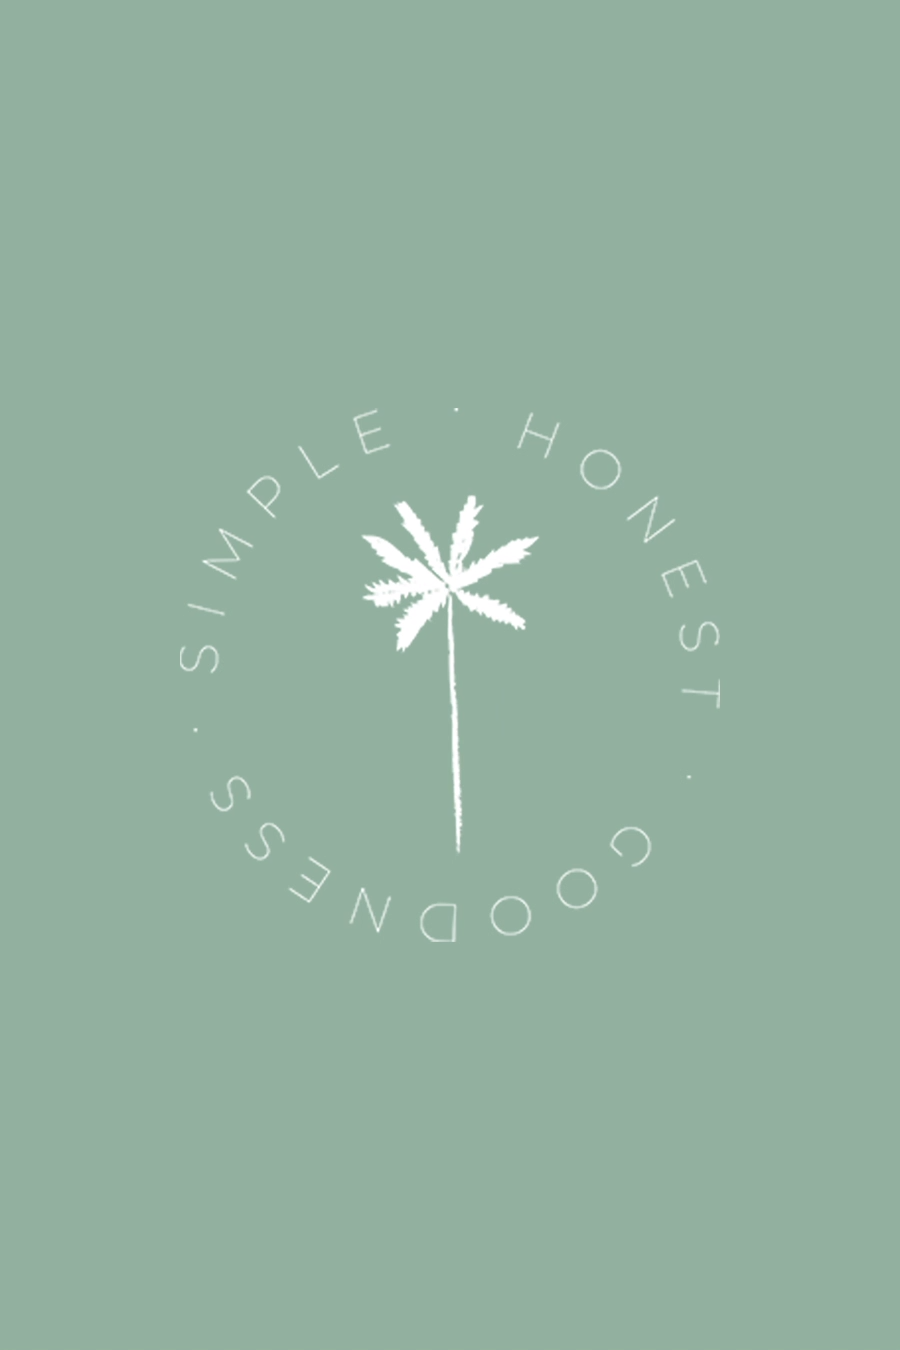 Minimal plant brand icon